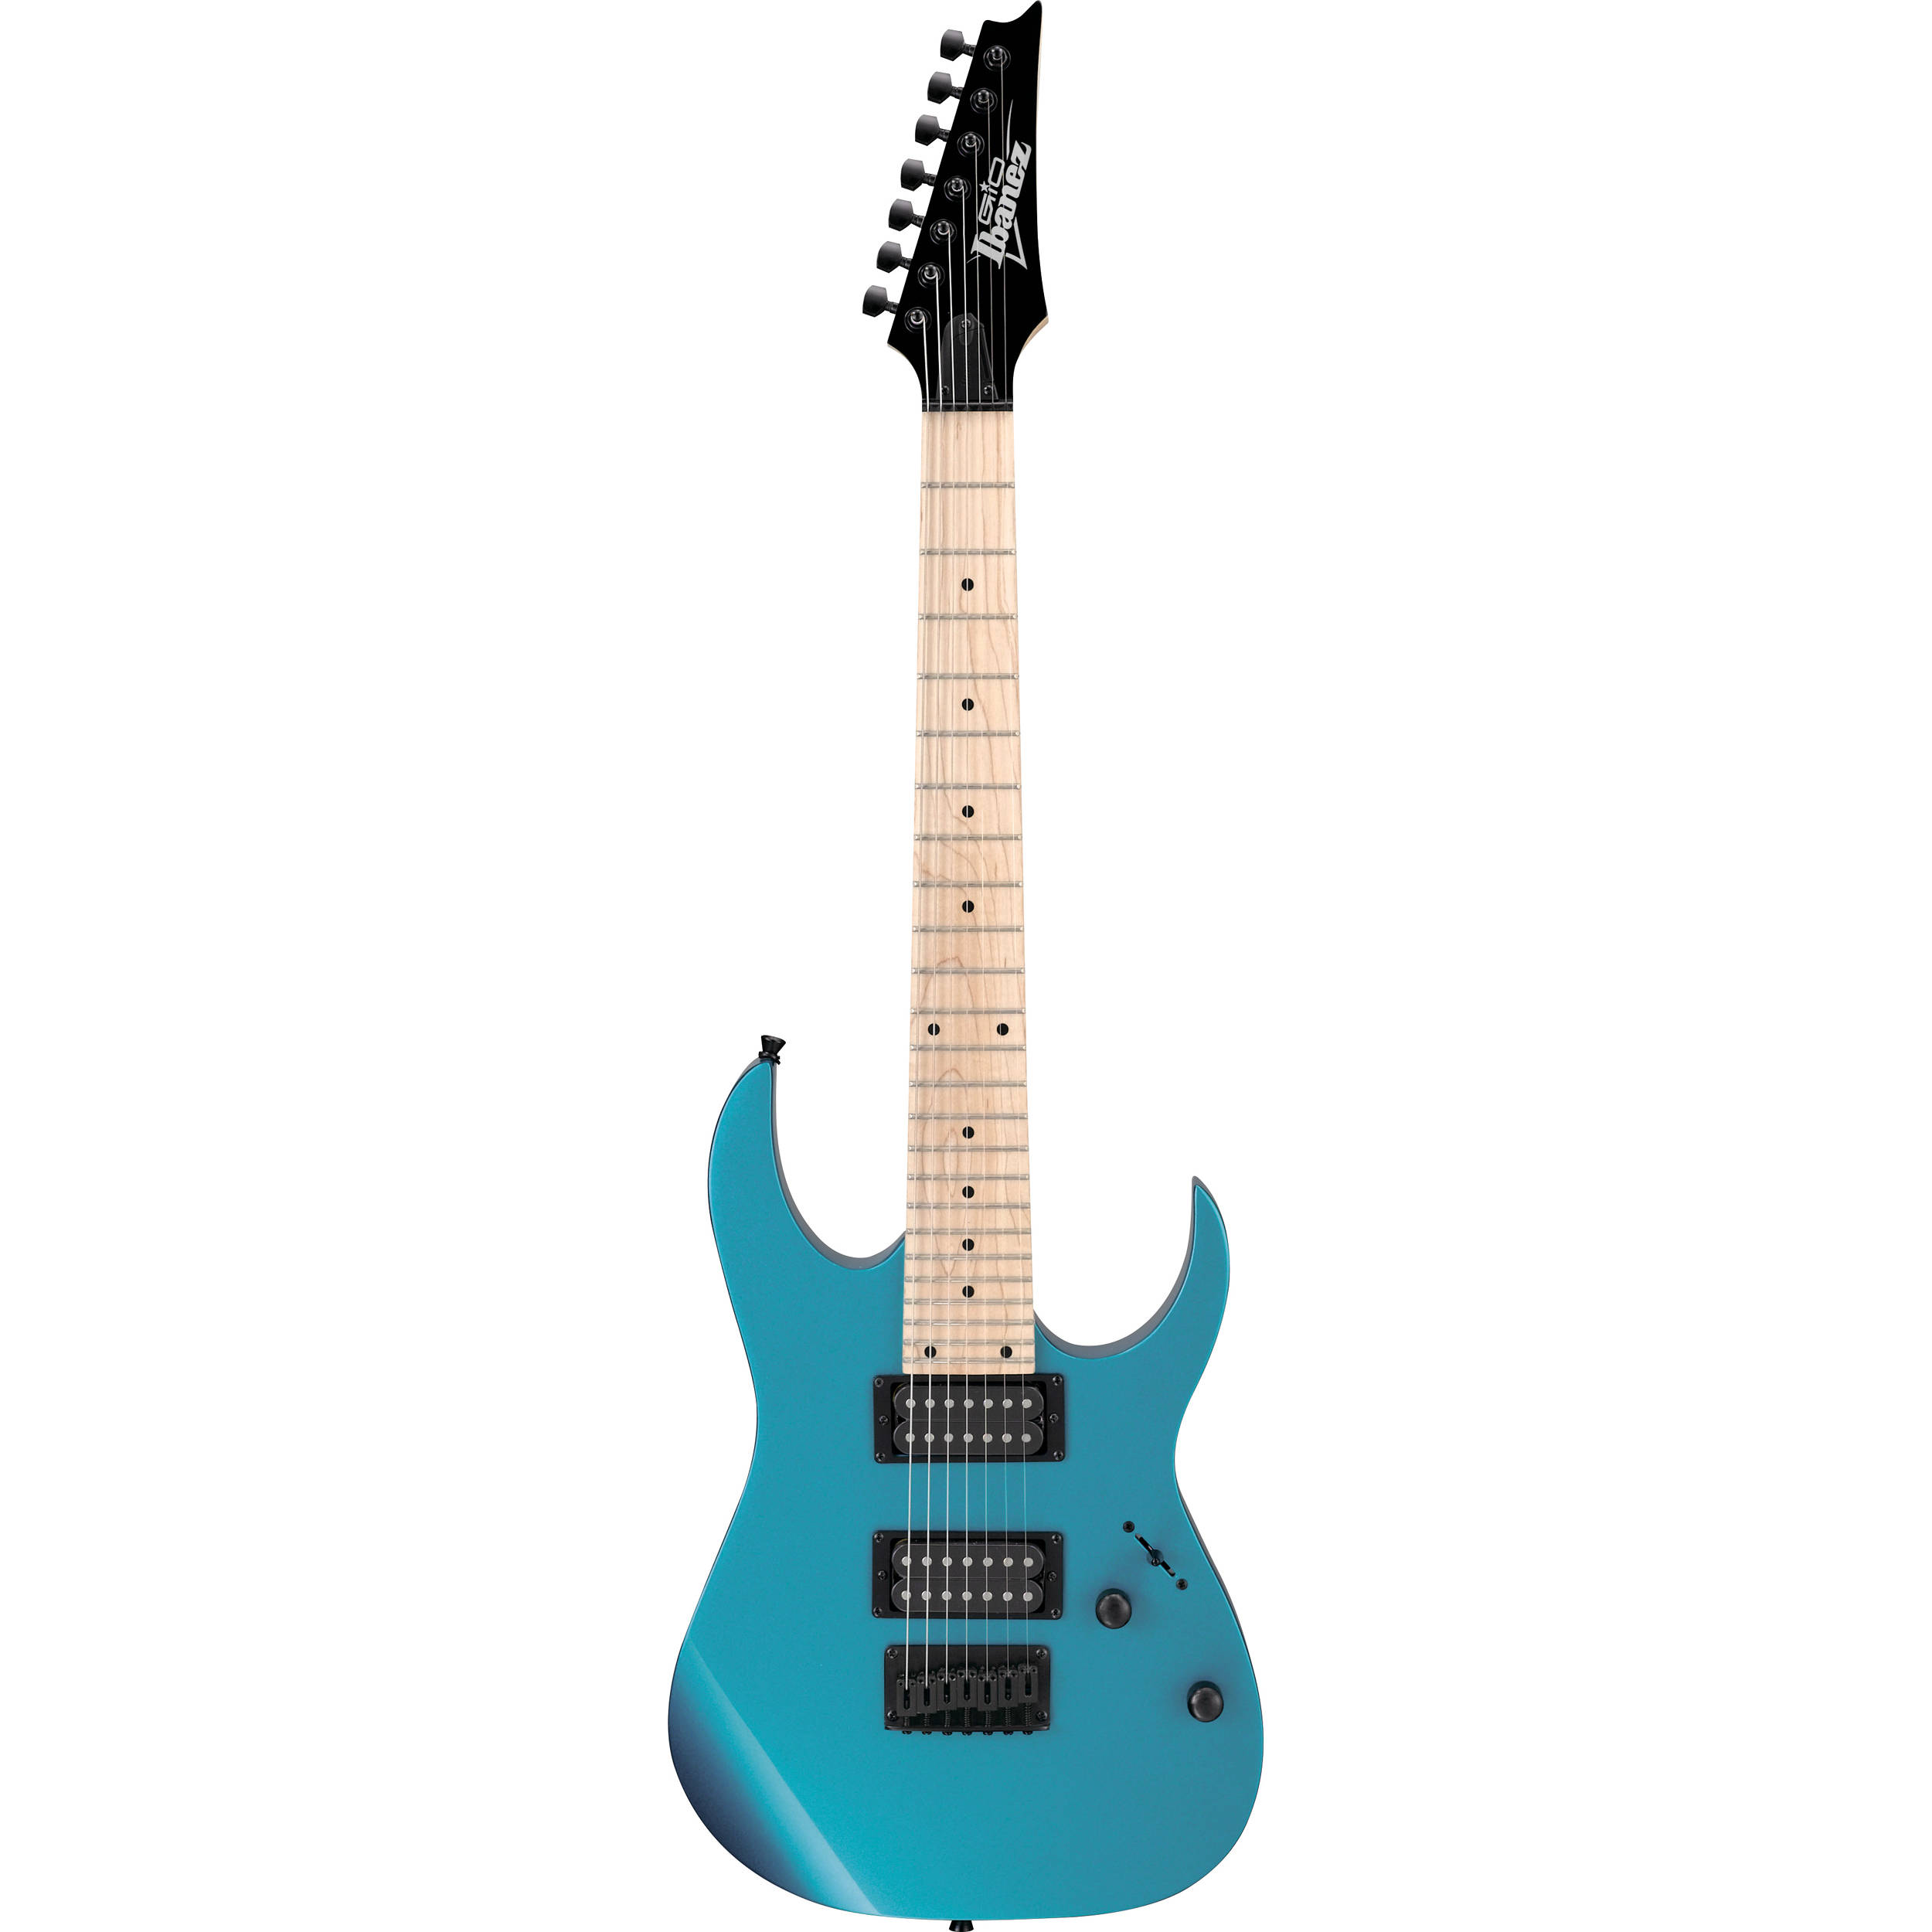 ibanez grg7221m gio series 7 string electric guitar grg7221mmlb. Black Bedroom Furniture Sets. Home Design Ideas